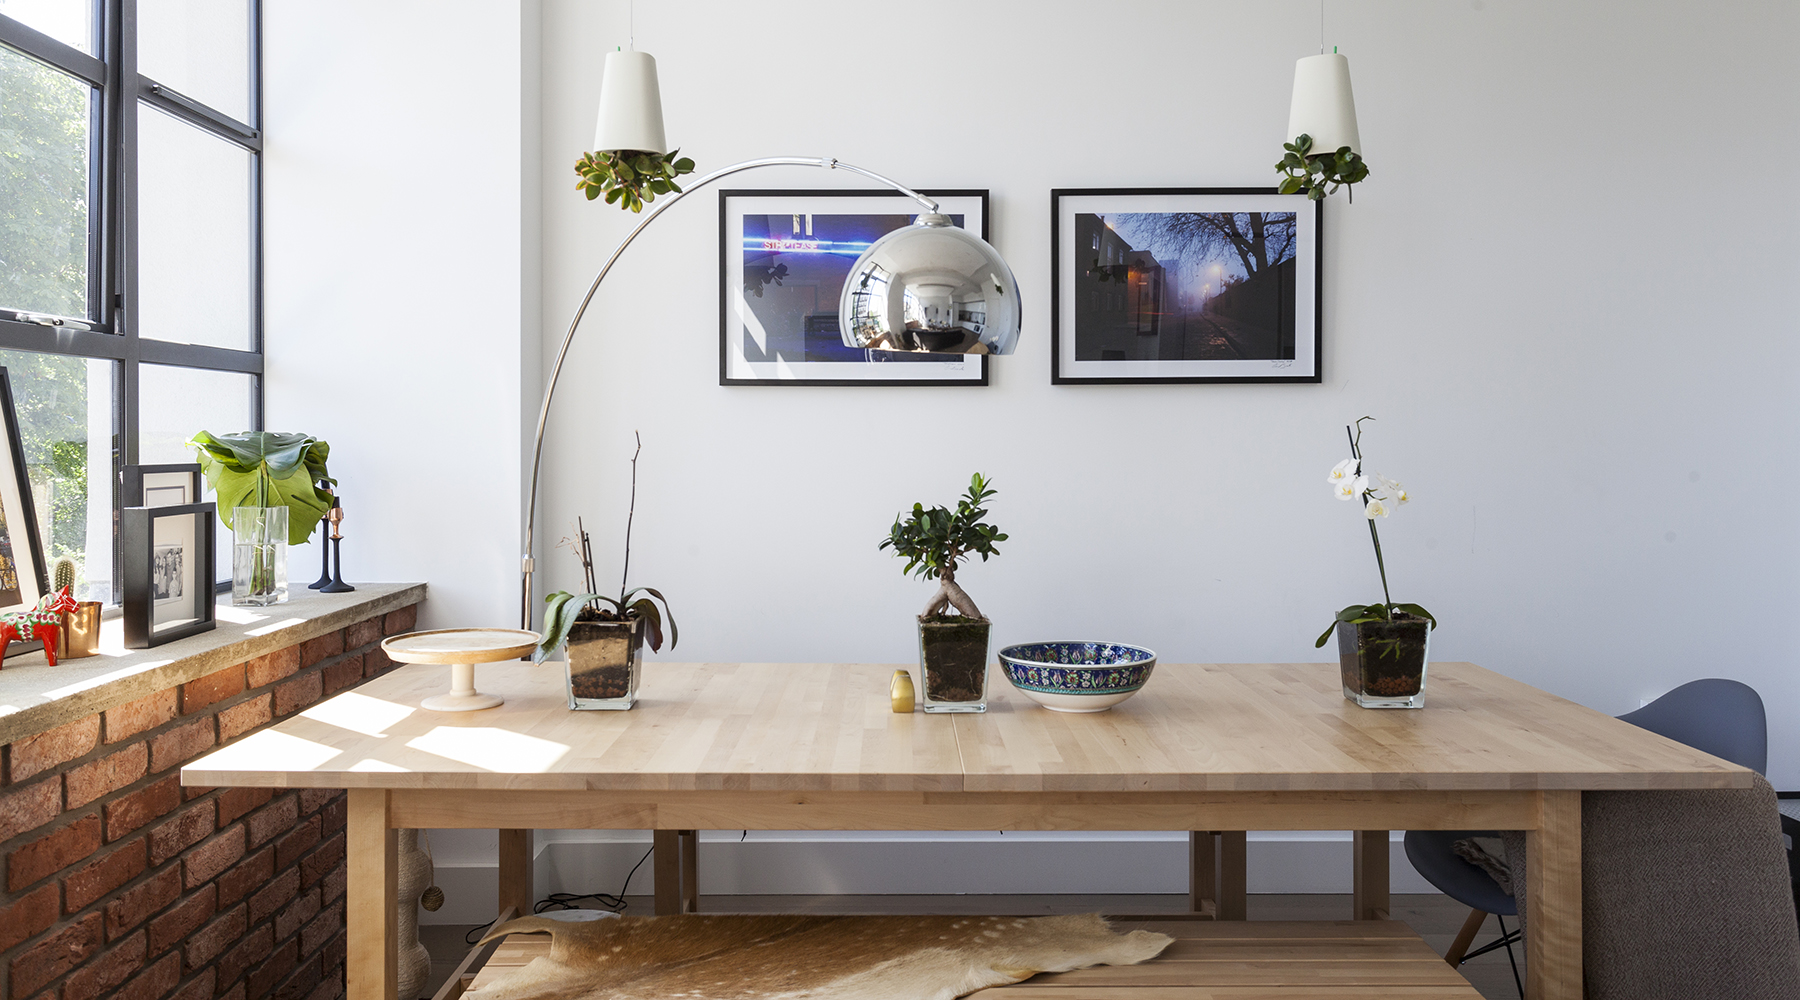 vorbild skandinavien beleuchtungstipps aus dem hohen norden. Black Bedroom Furniture Sets. Home Design Ideas